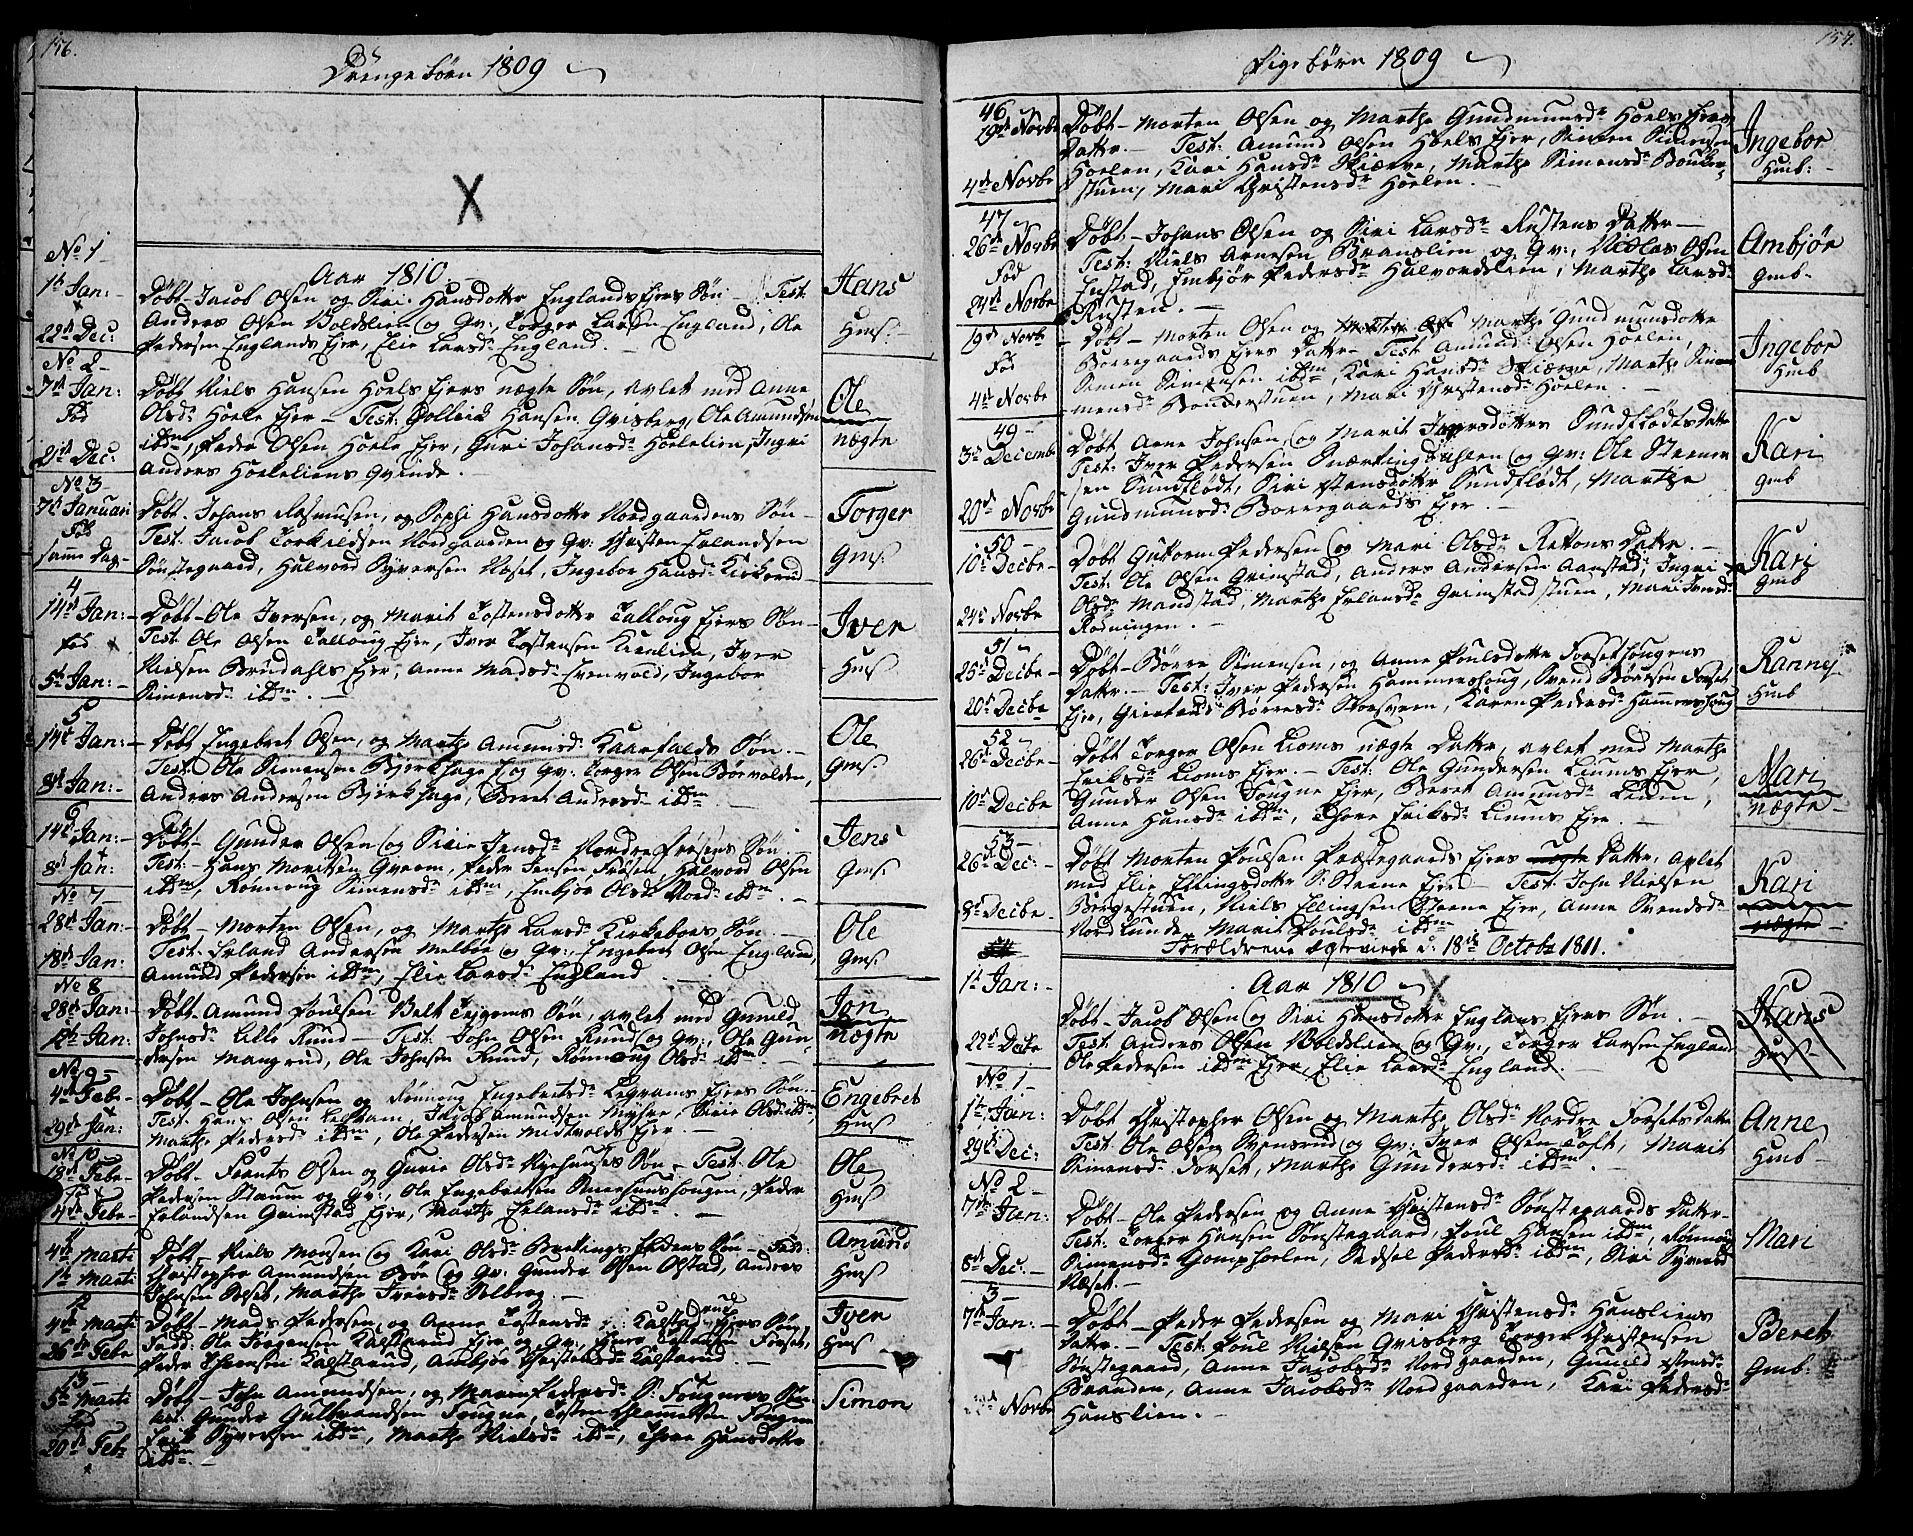 SAH, Gausdal prestekontor, Ministerialbok nr. 4, 1809-1817, s. 156-157